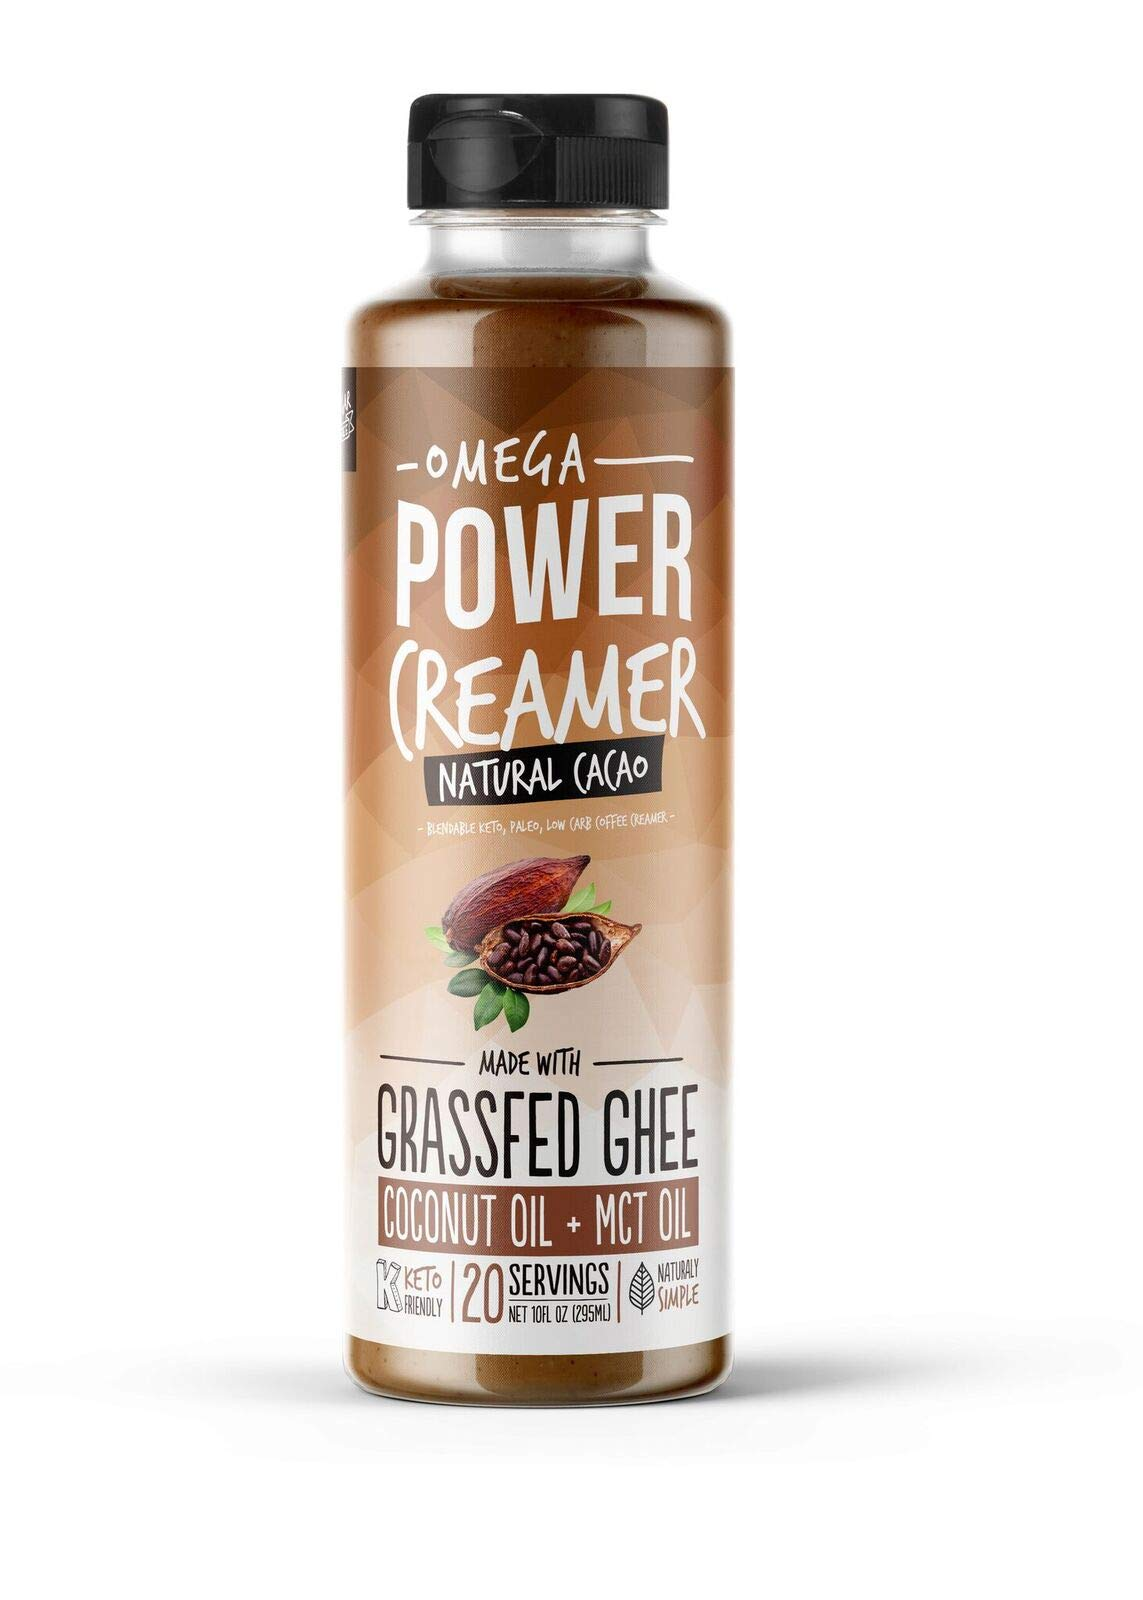 Omega PowerCreamer - CACAO - Grass-fed Ghee, Organic Coconut Oil, MCT Oil, Organic Cacao Powder | Liquid Keto Coffee Creamer | Paleo, Sugar Free, Unsweetened 10 fl oz (20 servings)